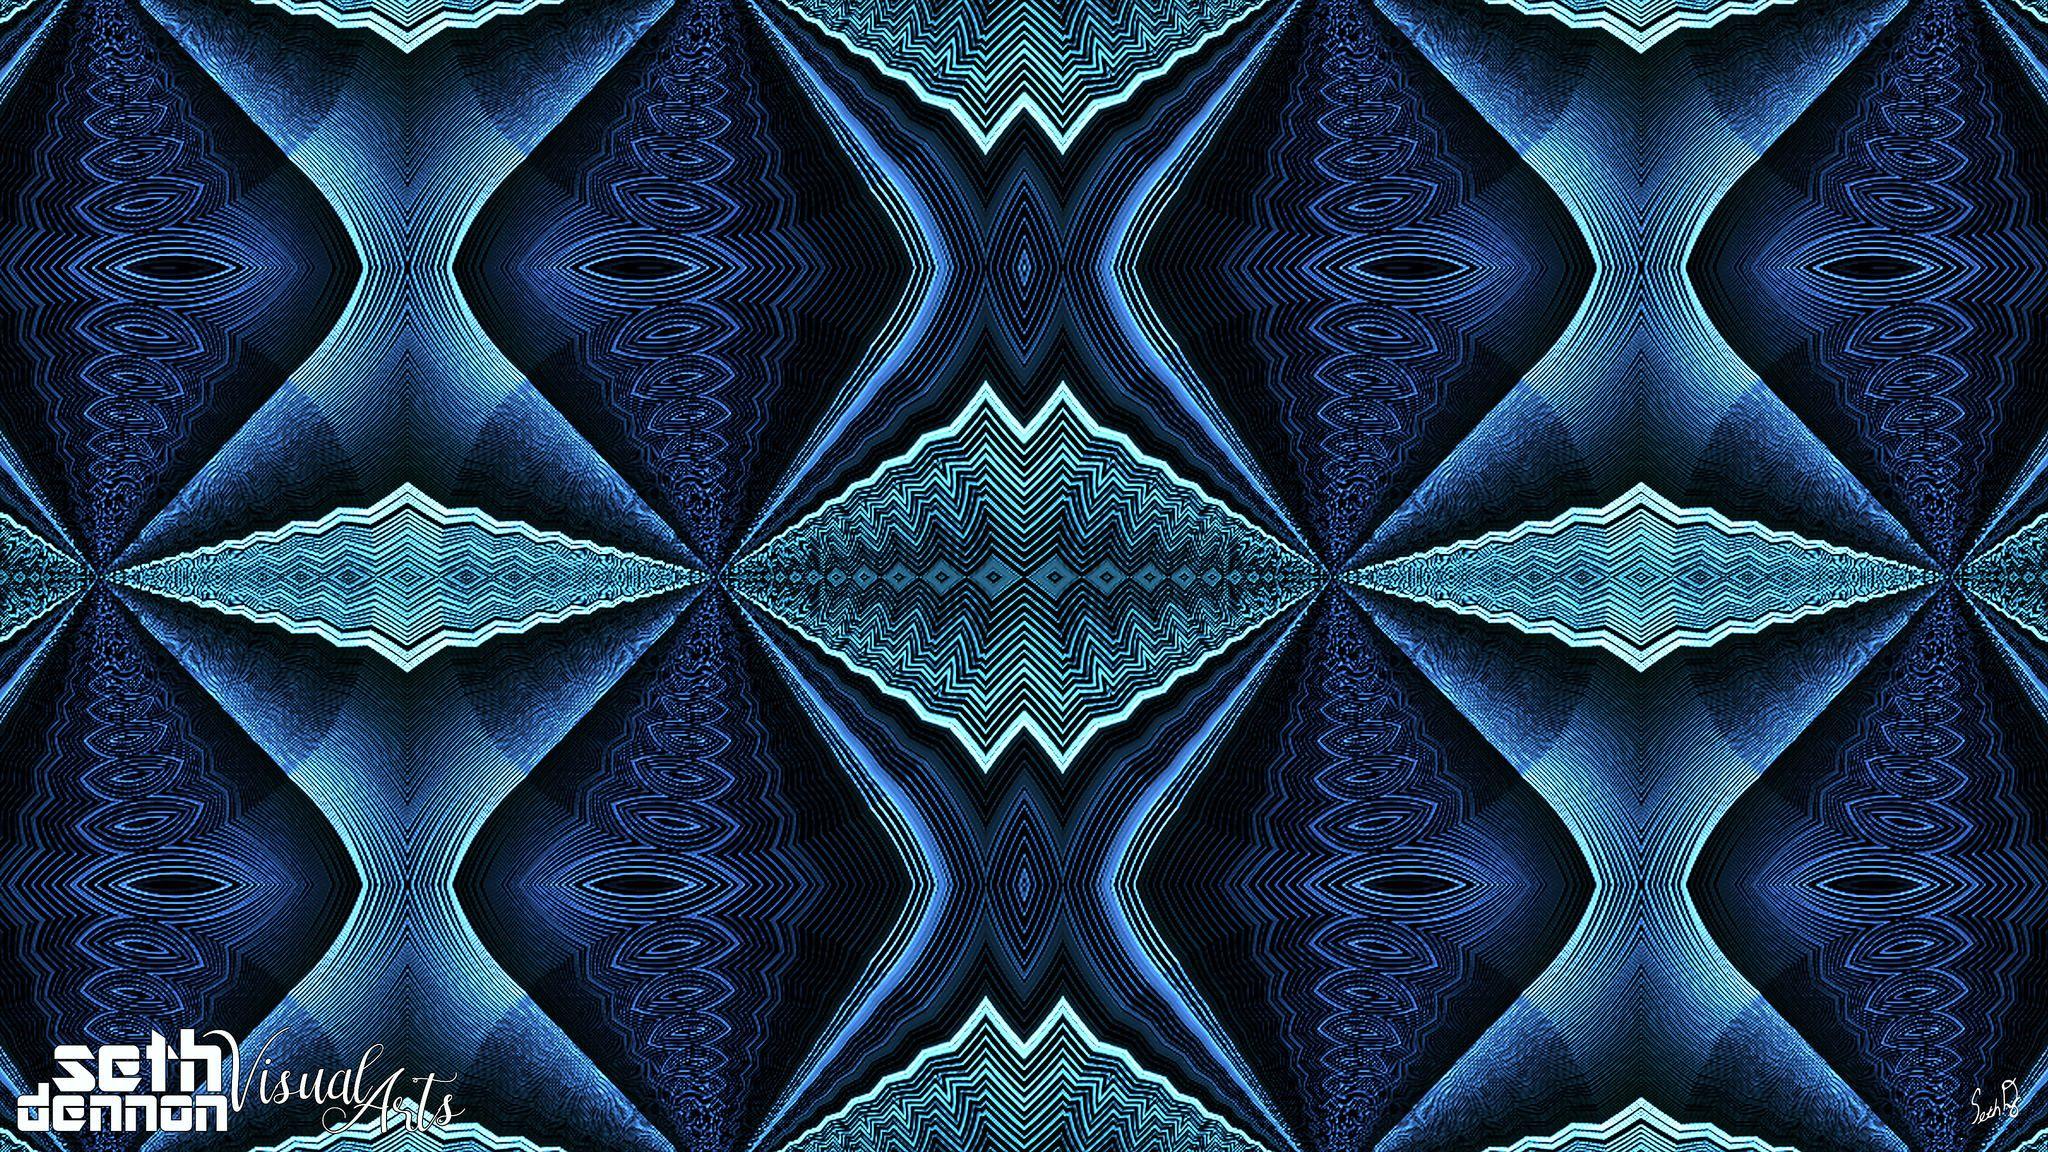 42217 kaleidoscopic humanoids fractal patterns fractal